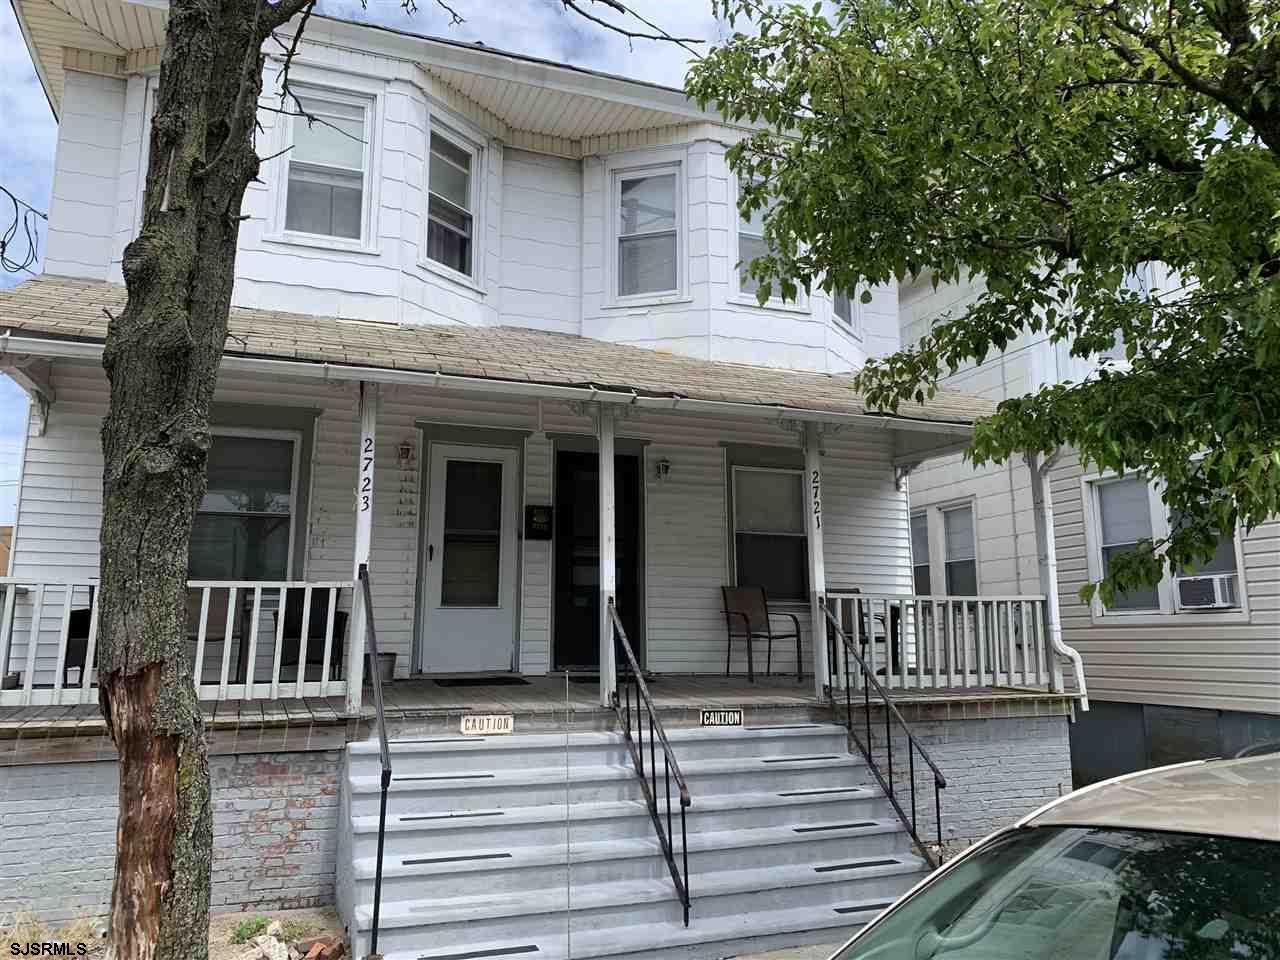 2723 Fairmount Ave, Atlantic City, NJ, 08401